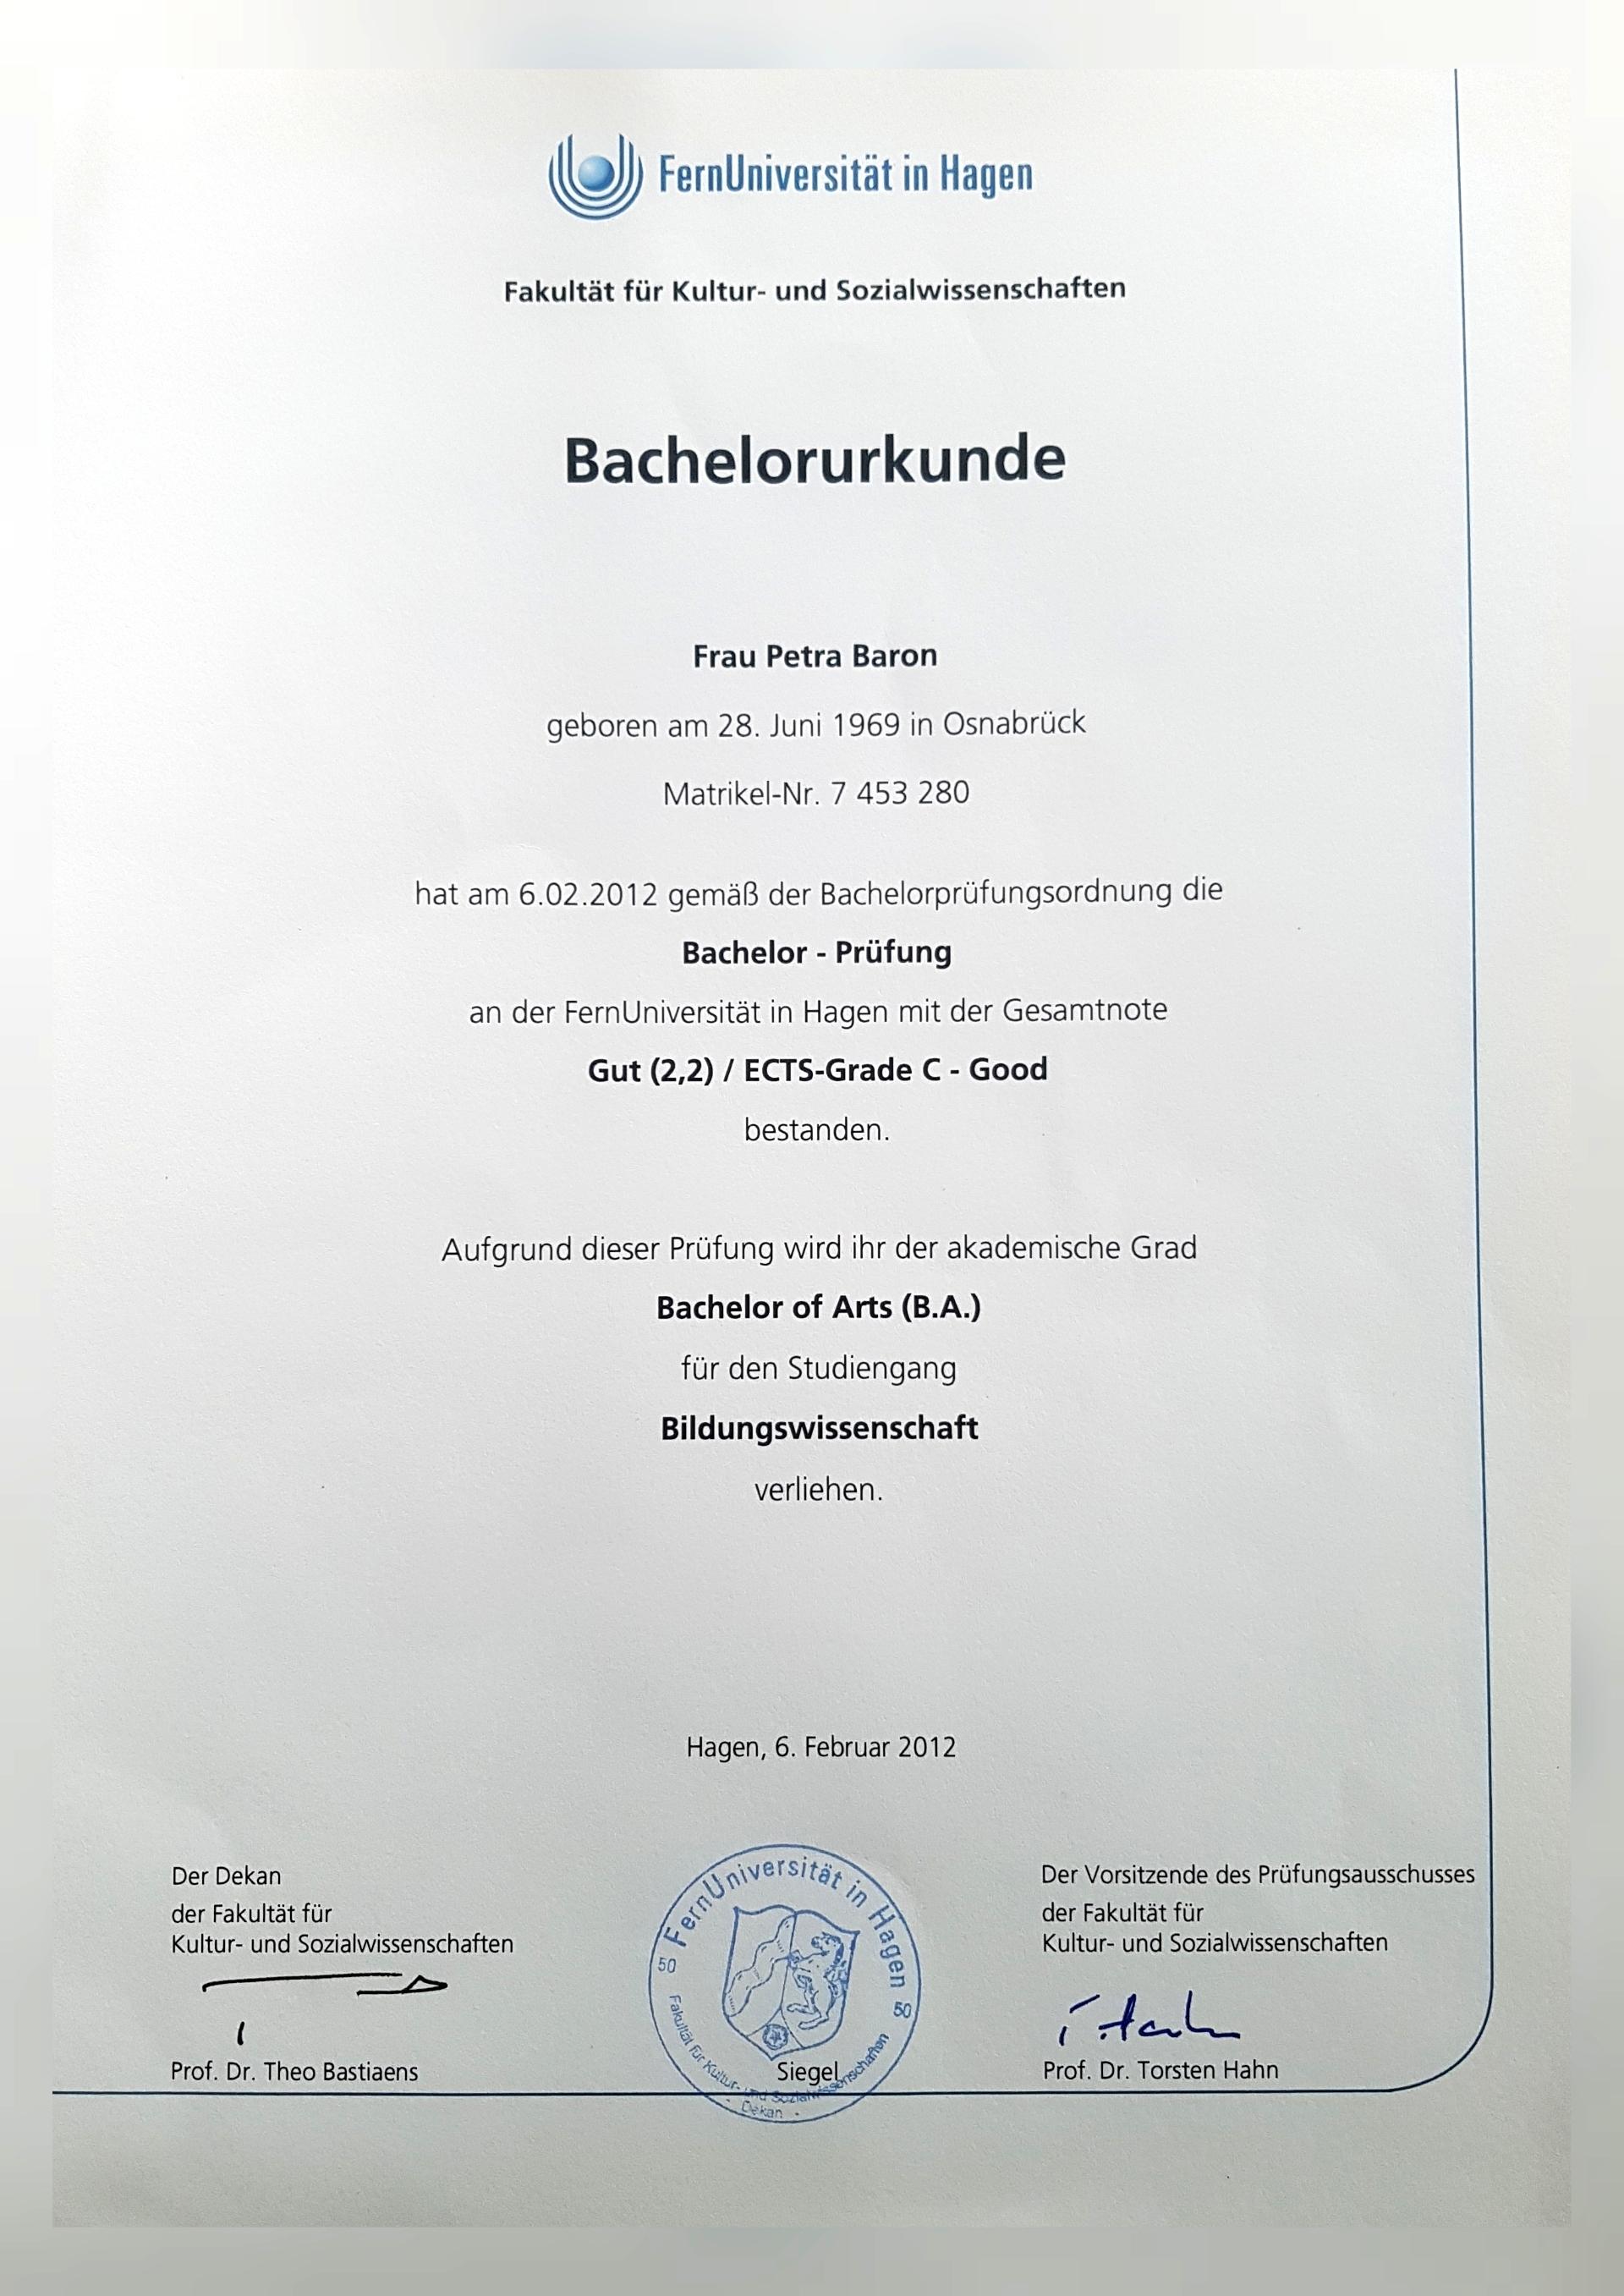 Bachelor Urkunde zum Thema Bildungswissenschaft (Bachelor of Arts)